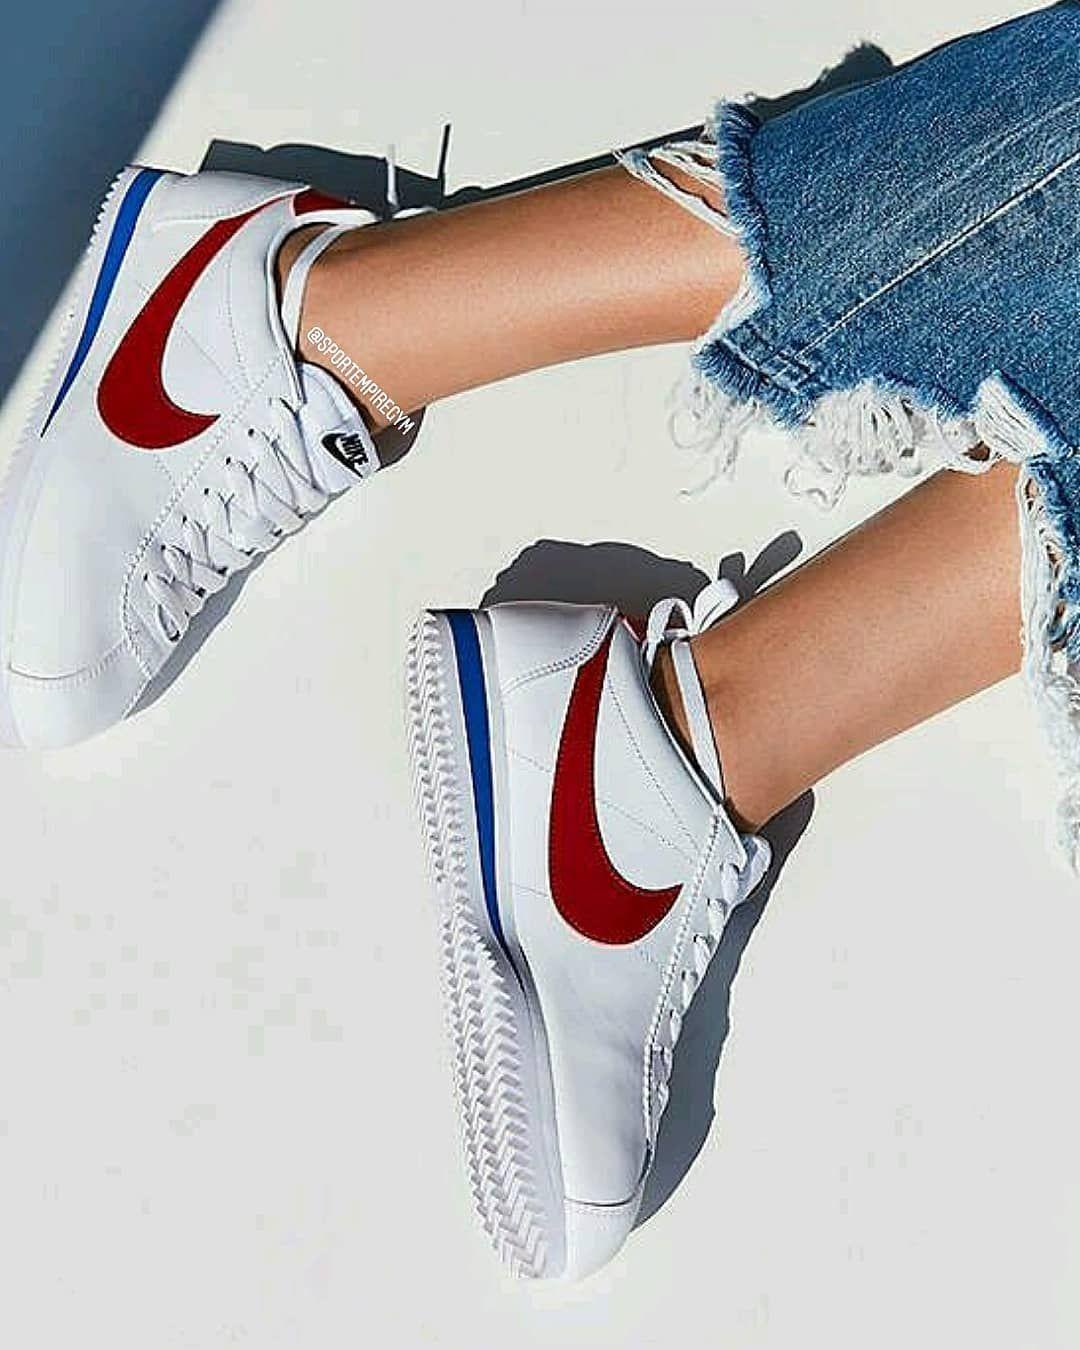 new concept 130b0 95d30 Nike Cortez 90s 3006544327 Confiables y seguros Entrega ...